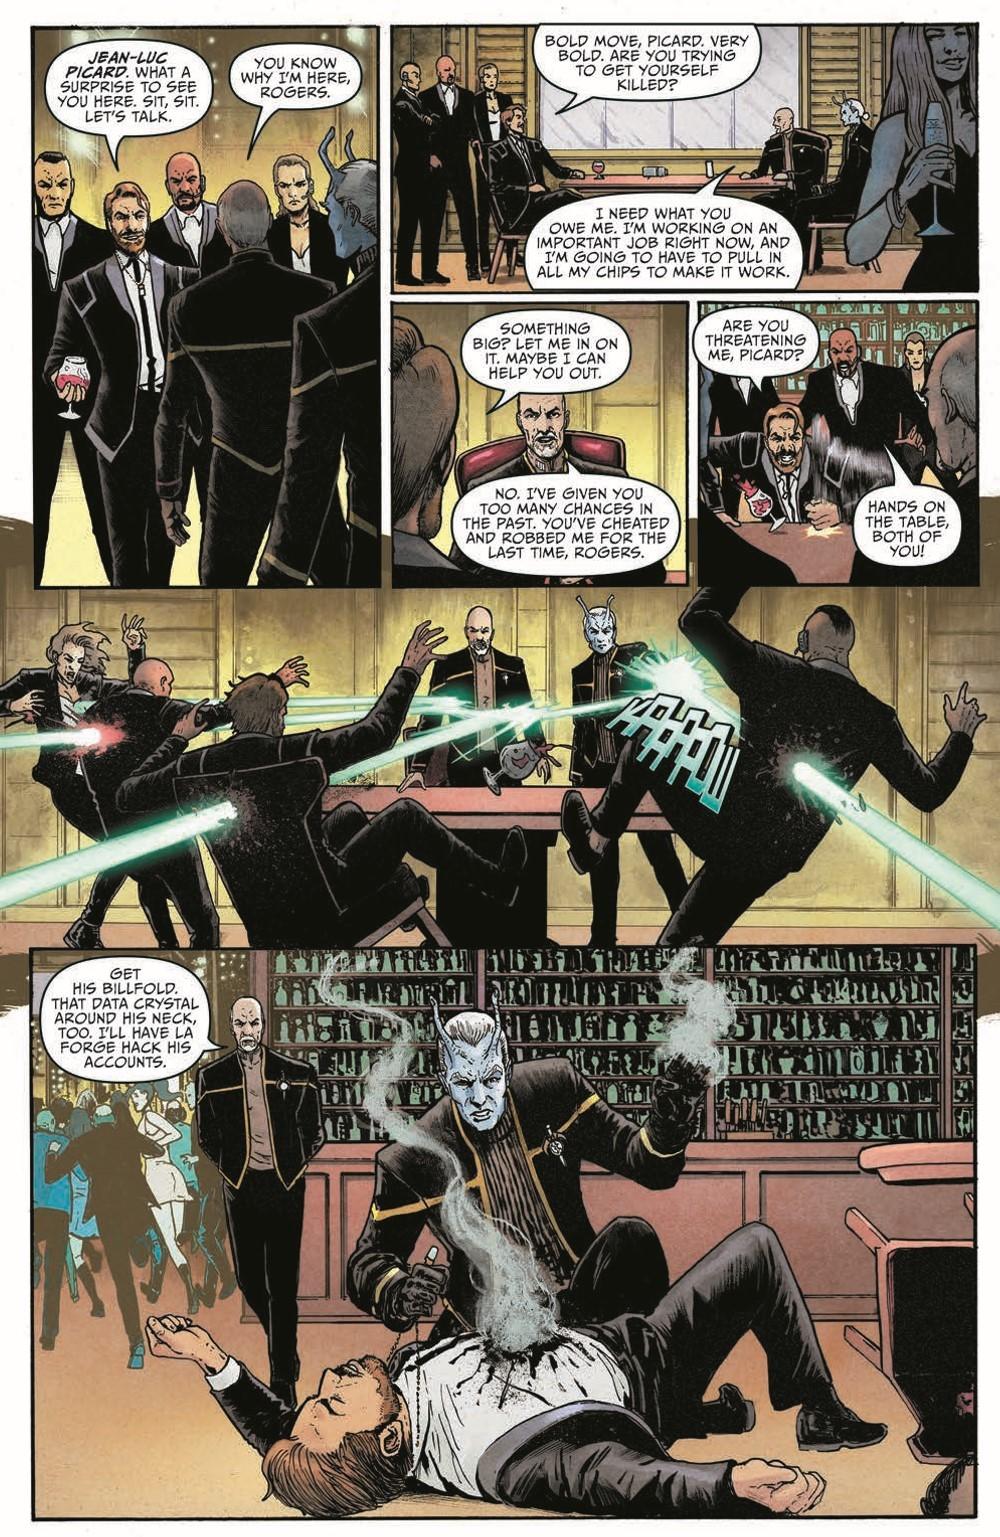 ST_TMW01-pr-4 ComicList Previews: STAR TREK THE MIRROR WAR #1